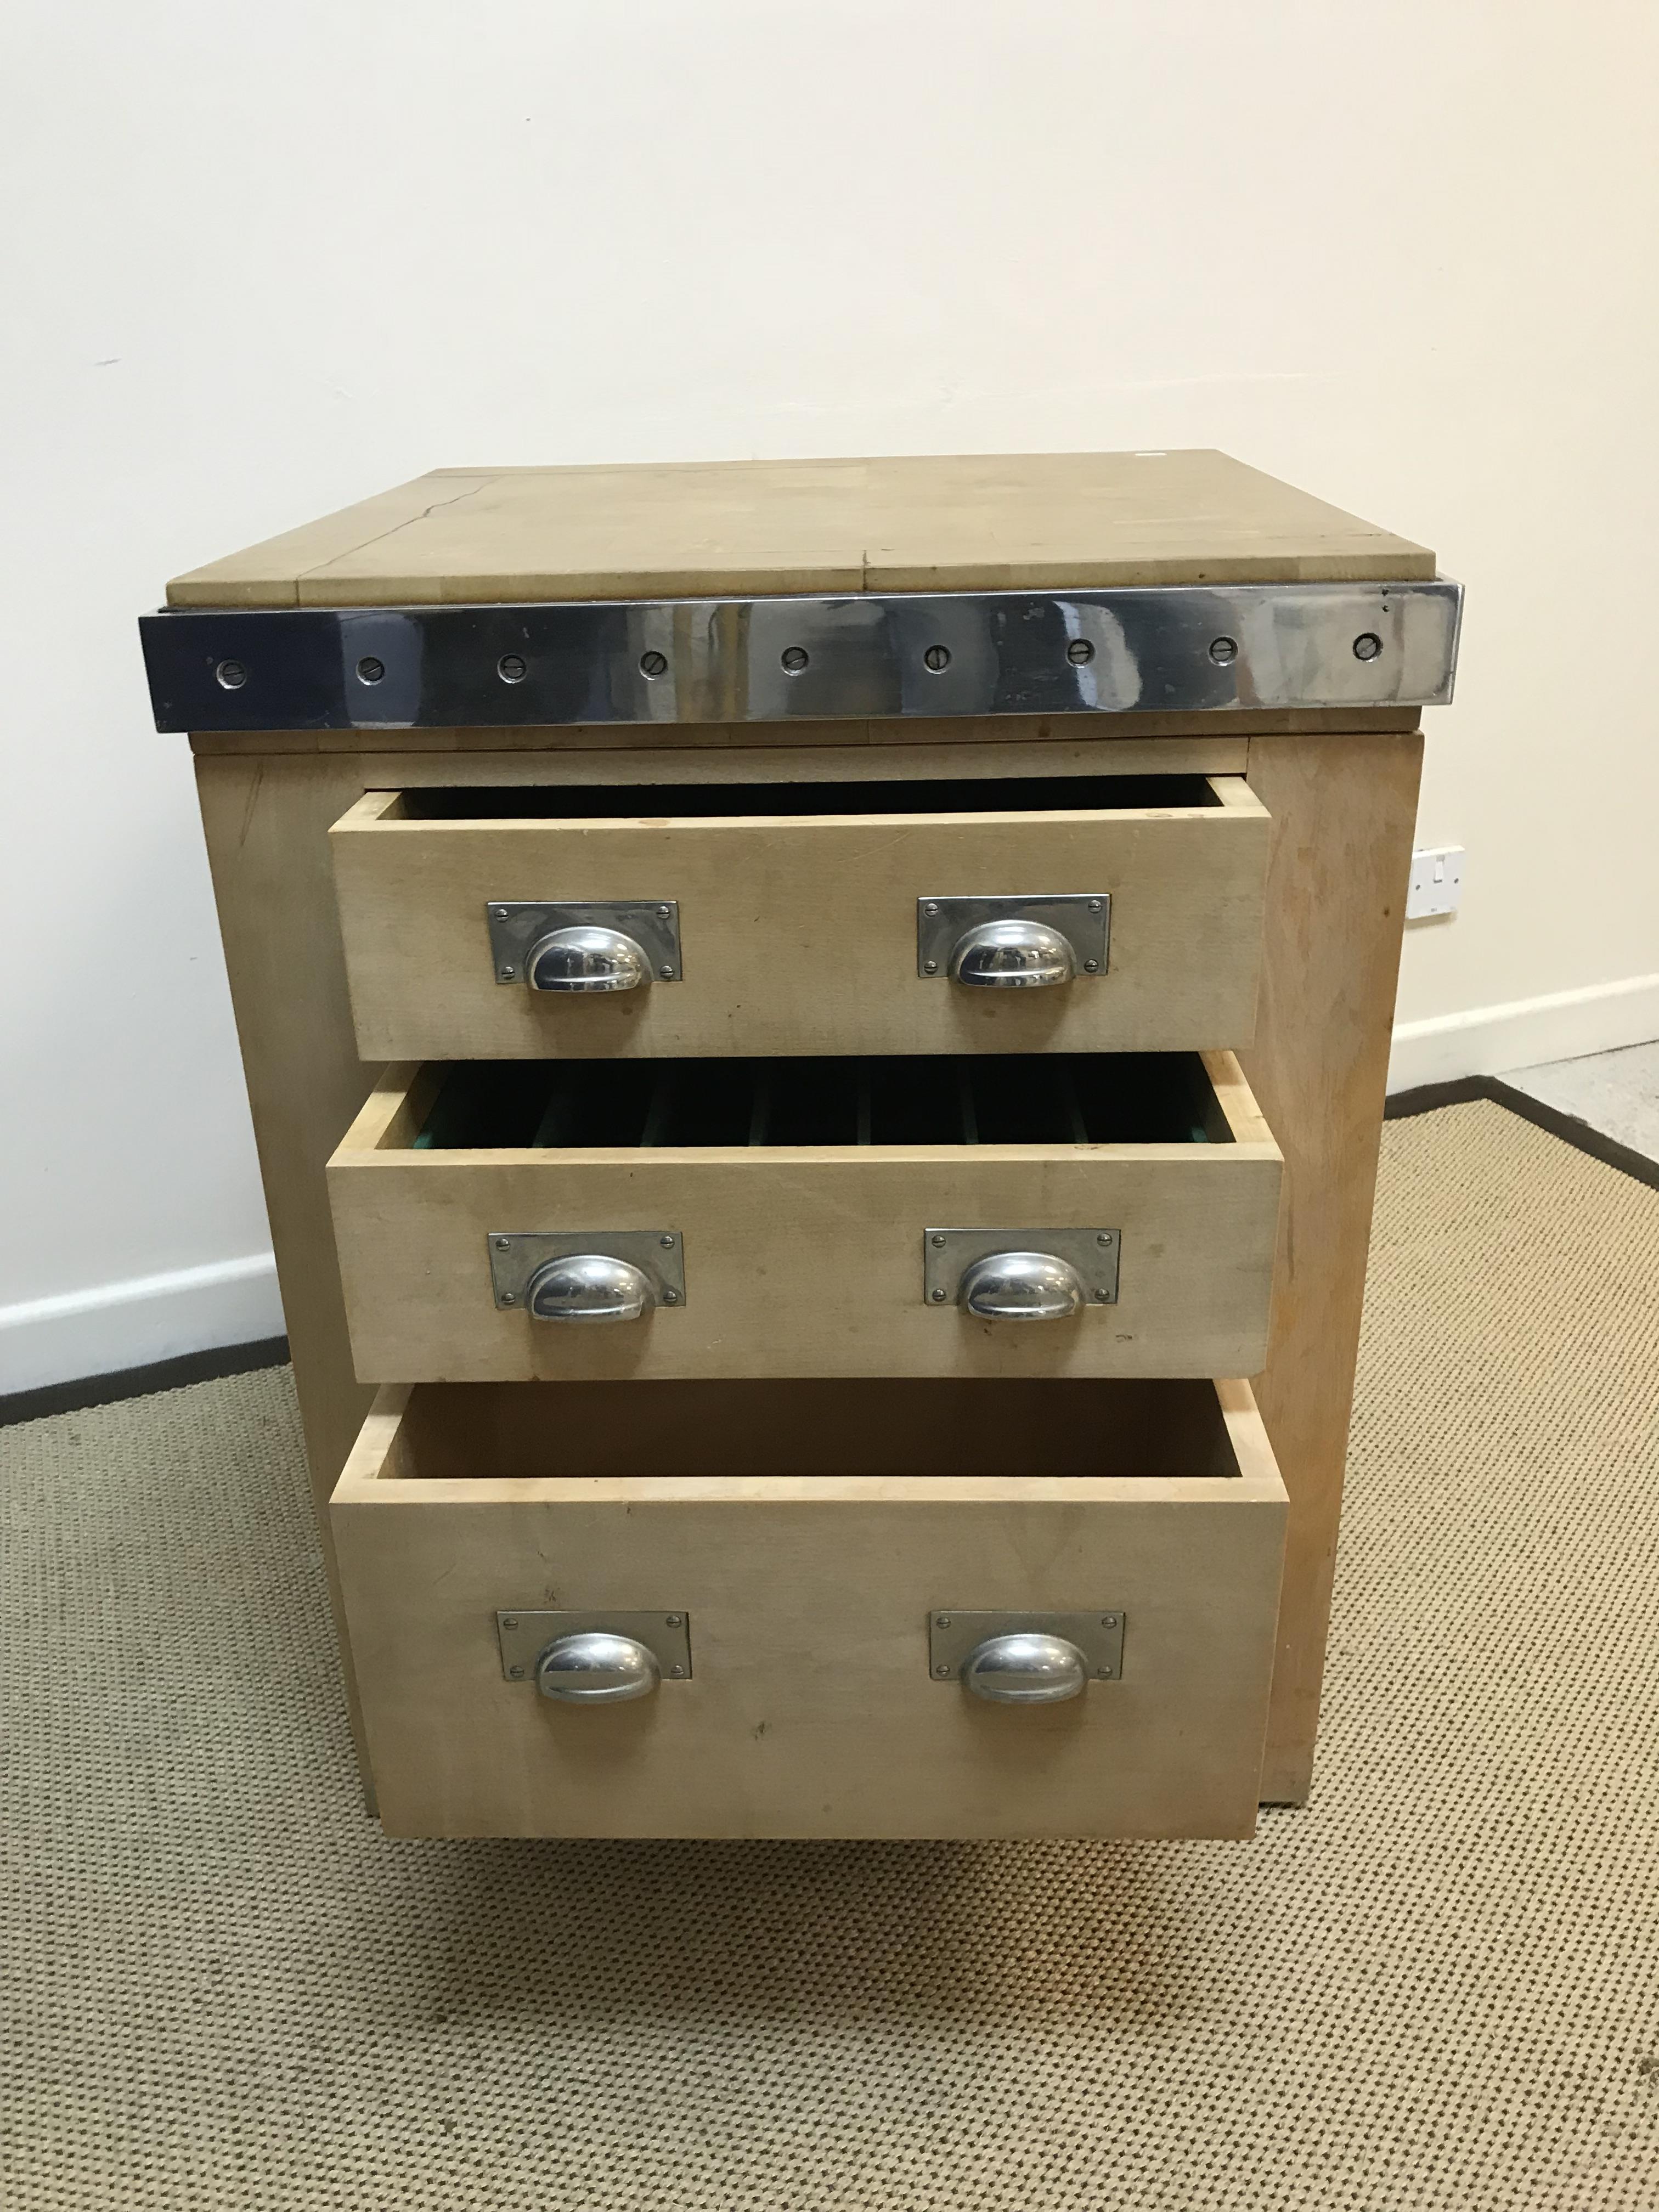 A modern metal bound wooden kitchen island / butcher's block with three drawers, 69.5 cm wide x 69